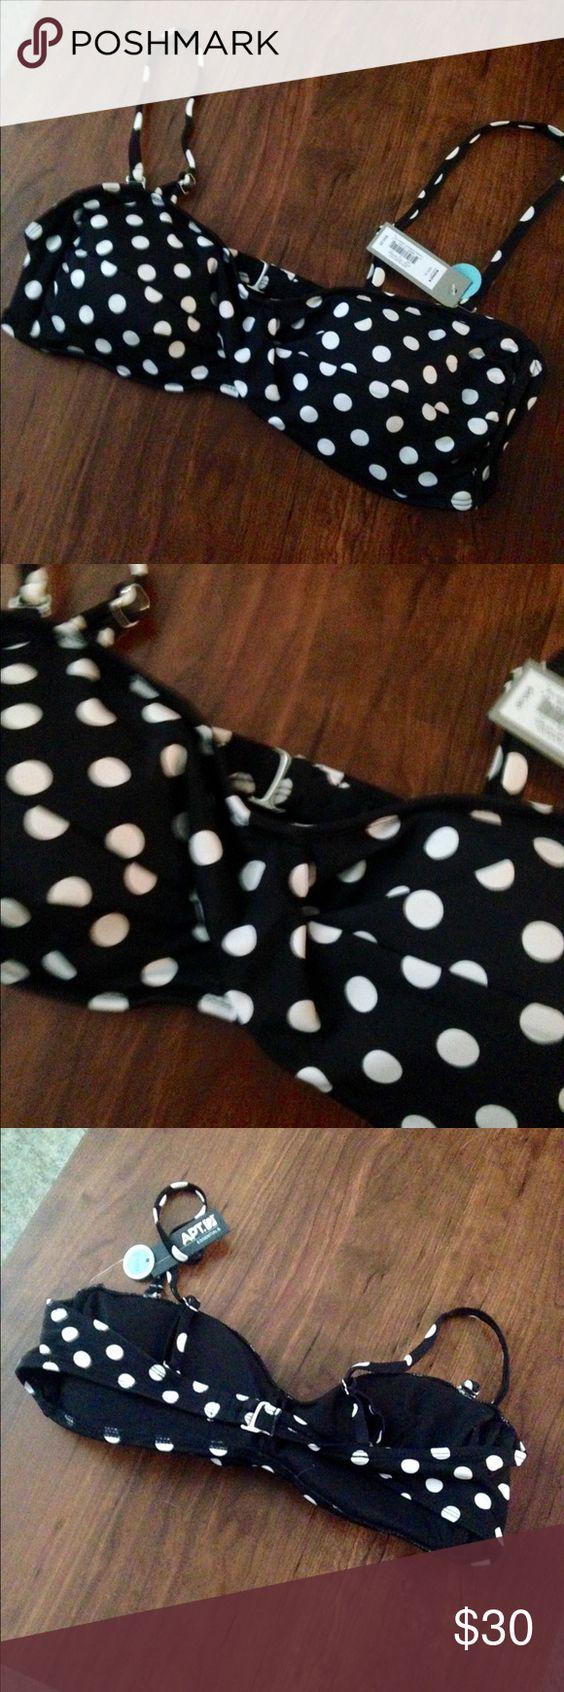 NWT Apt.9 Polka Dot Bandeau Bikini Top-B/C Cup NWT Apt.9 Polka Dot Bandeau Bikini Top-B/C Cup. Adjustable straps. Size XL but cut small. Open to offers! Apt. 9 Swim Bikinis